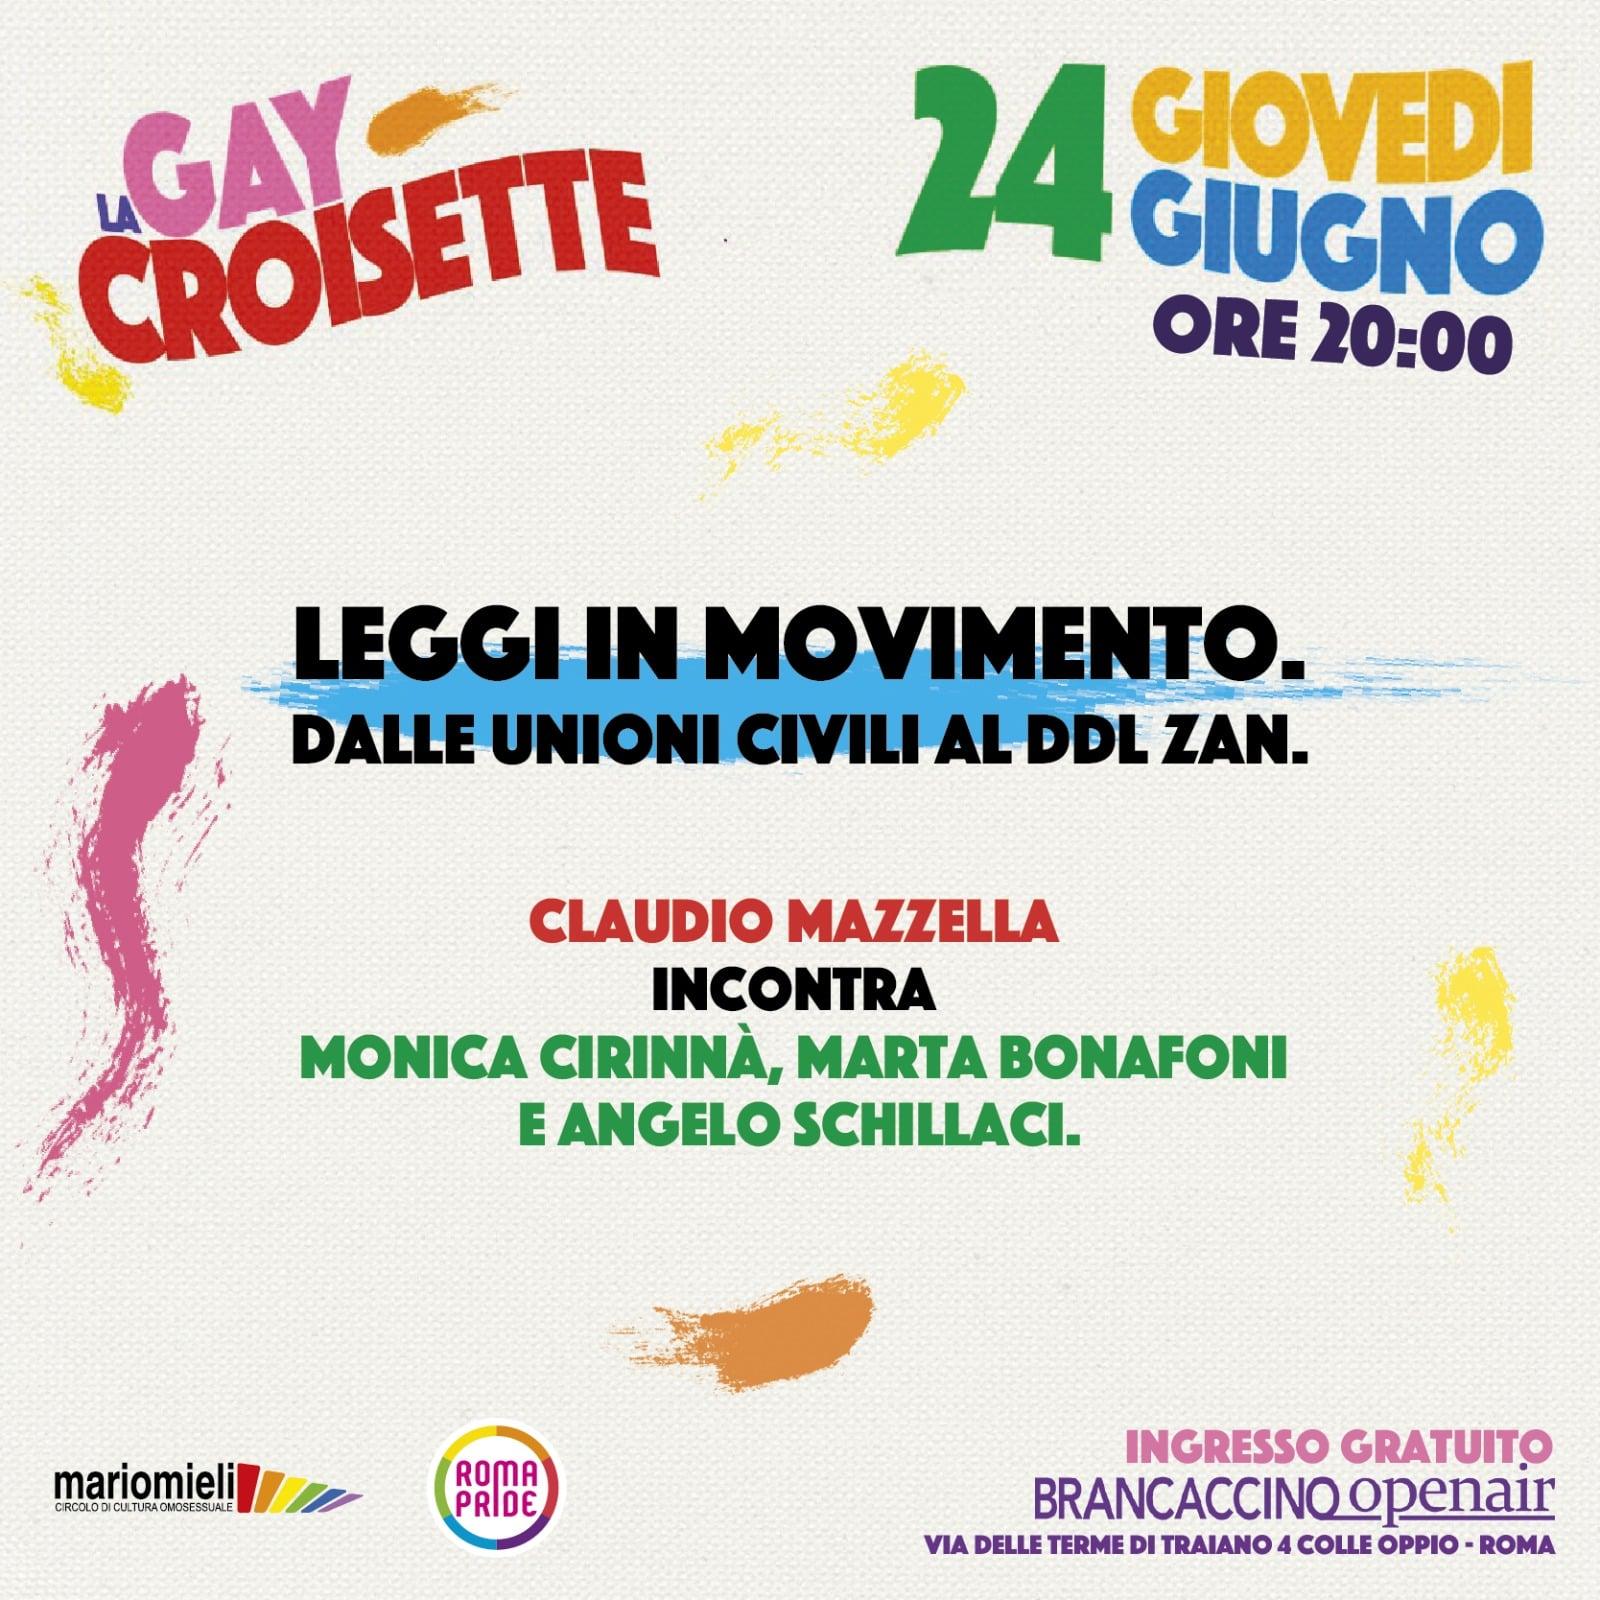 Roma Pride 2021 - GayCroisette del 24/06/2021